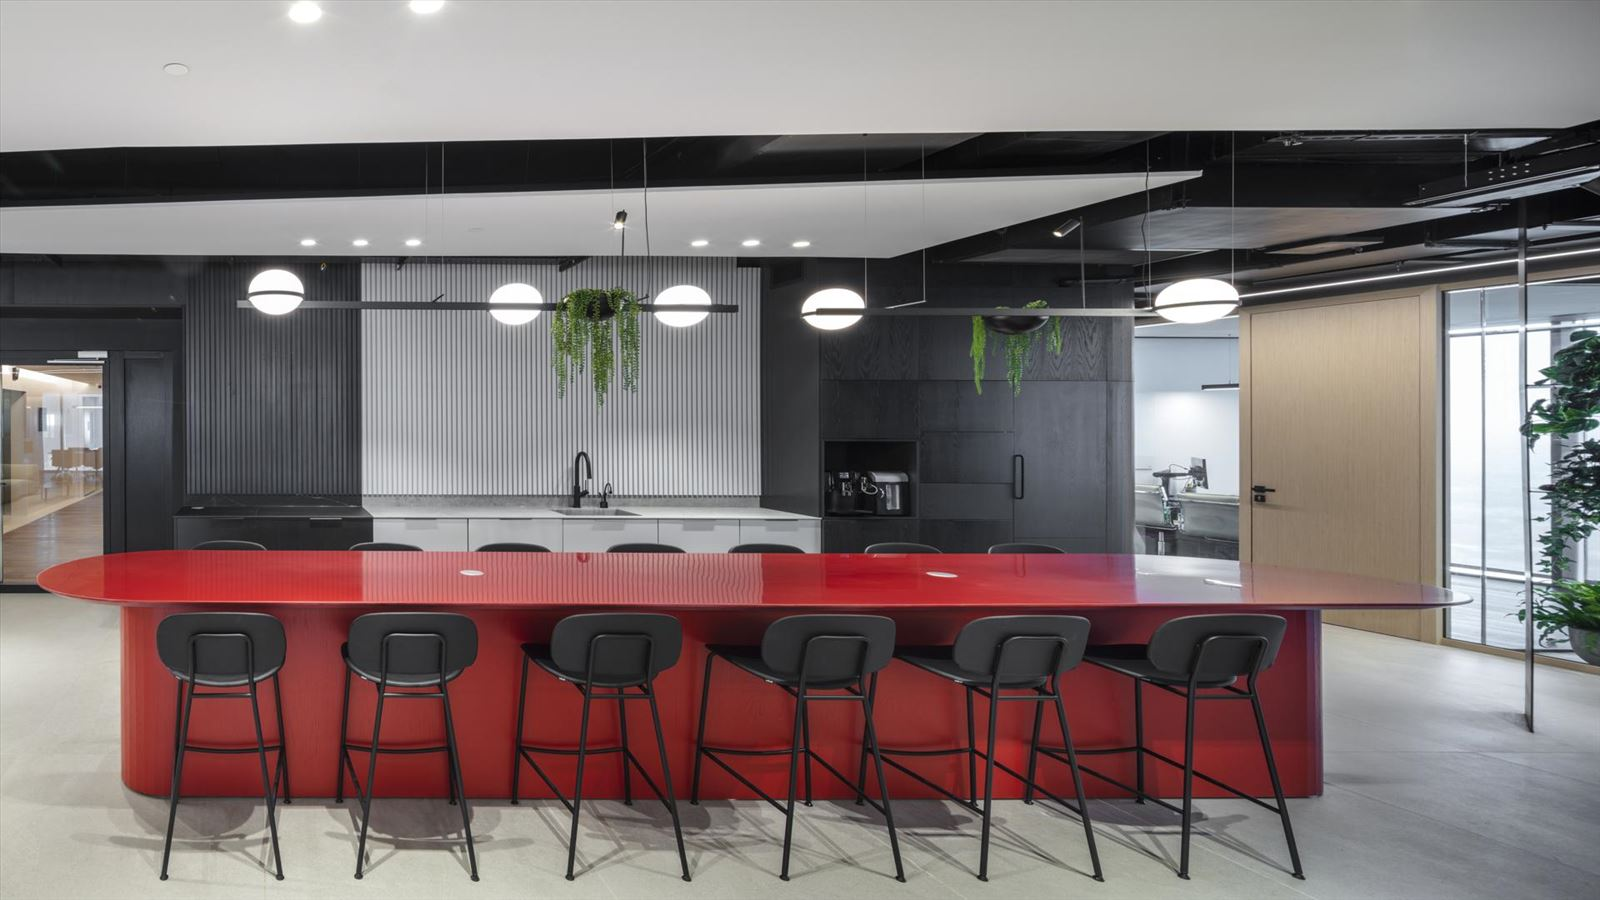 Fortissimo Offices – Tel Aviv מטבח המשרד מואר בגופי תאורה מיוחדים בתכנון דורי קמחי